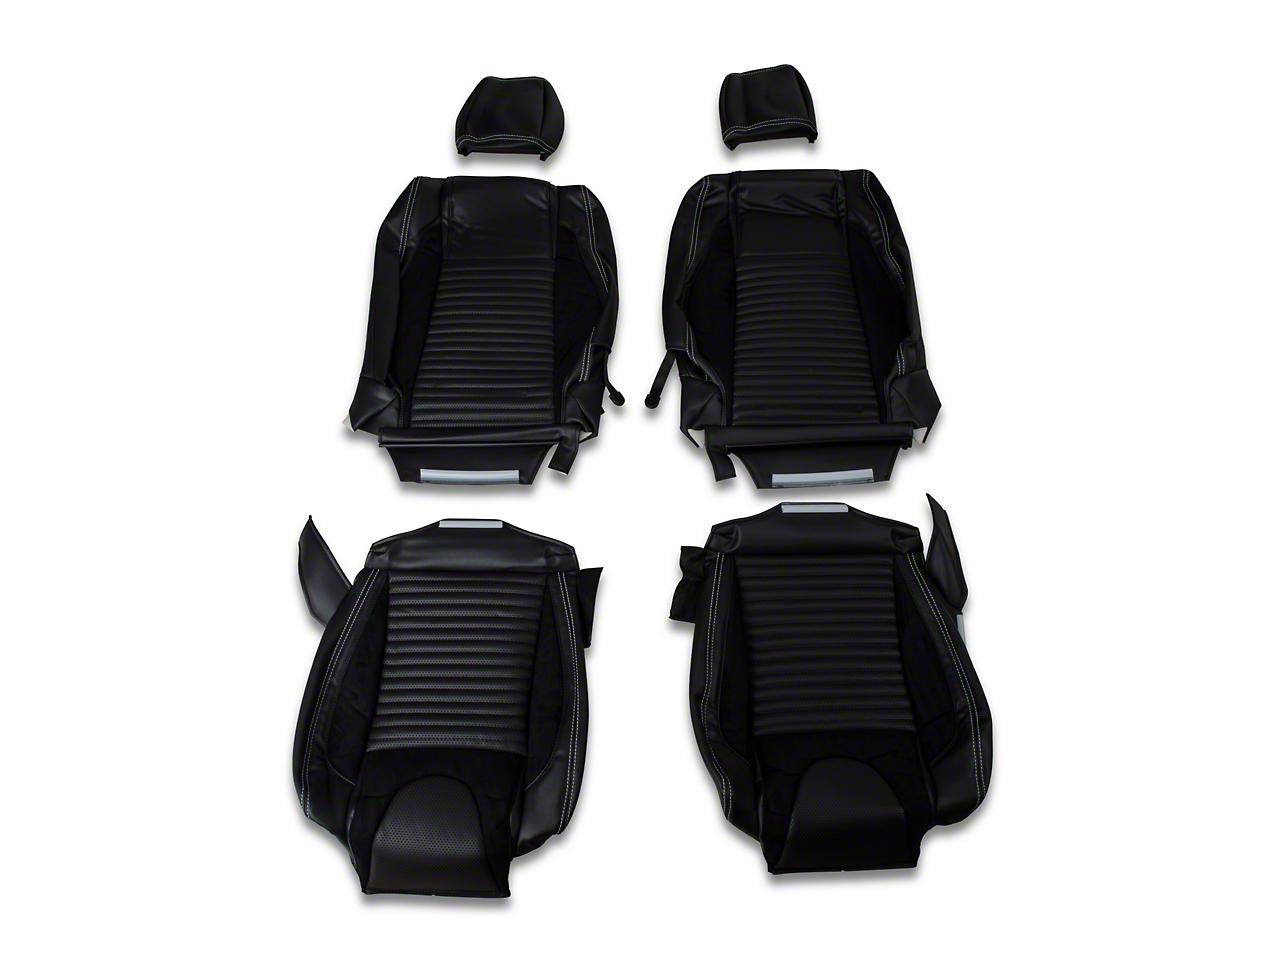 TMI Sport R Vinyl Upholstery Full Set - White Stitch (05-07 Convertible Non-Airbag)